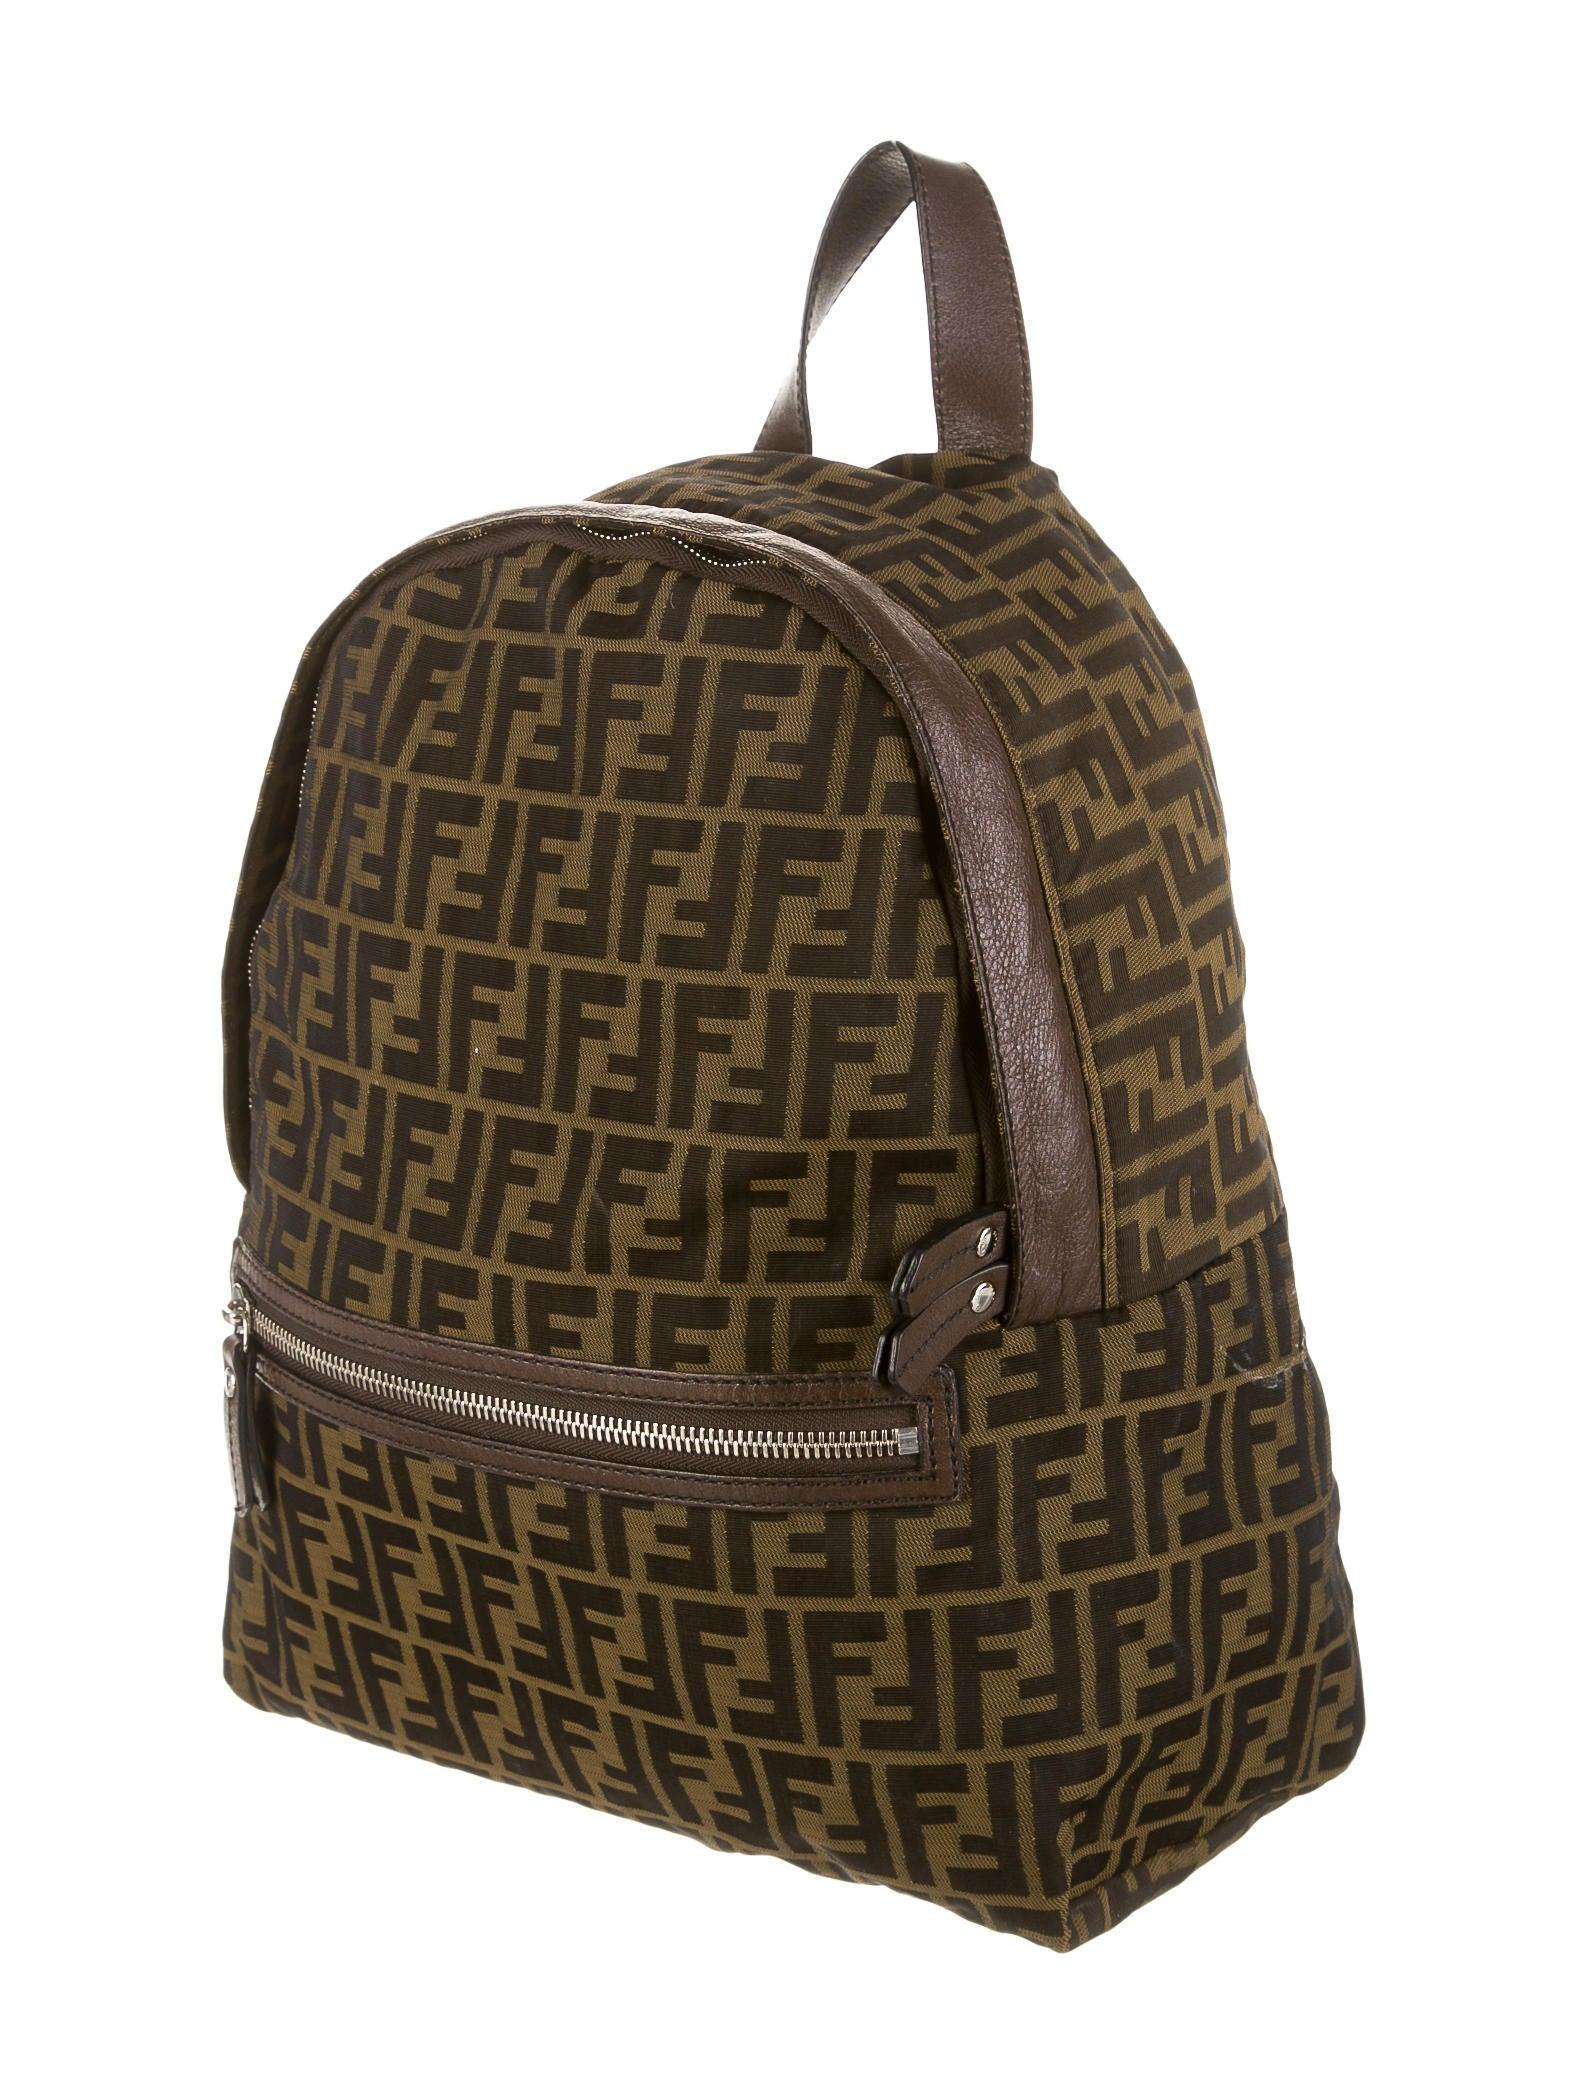 Fendi Zucca Backpack Handbags Fen30757 The Realreal